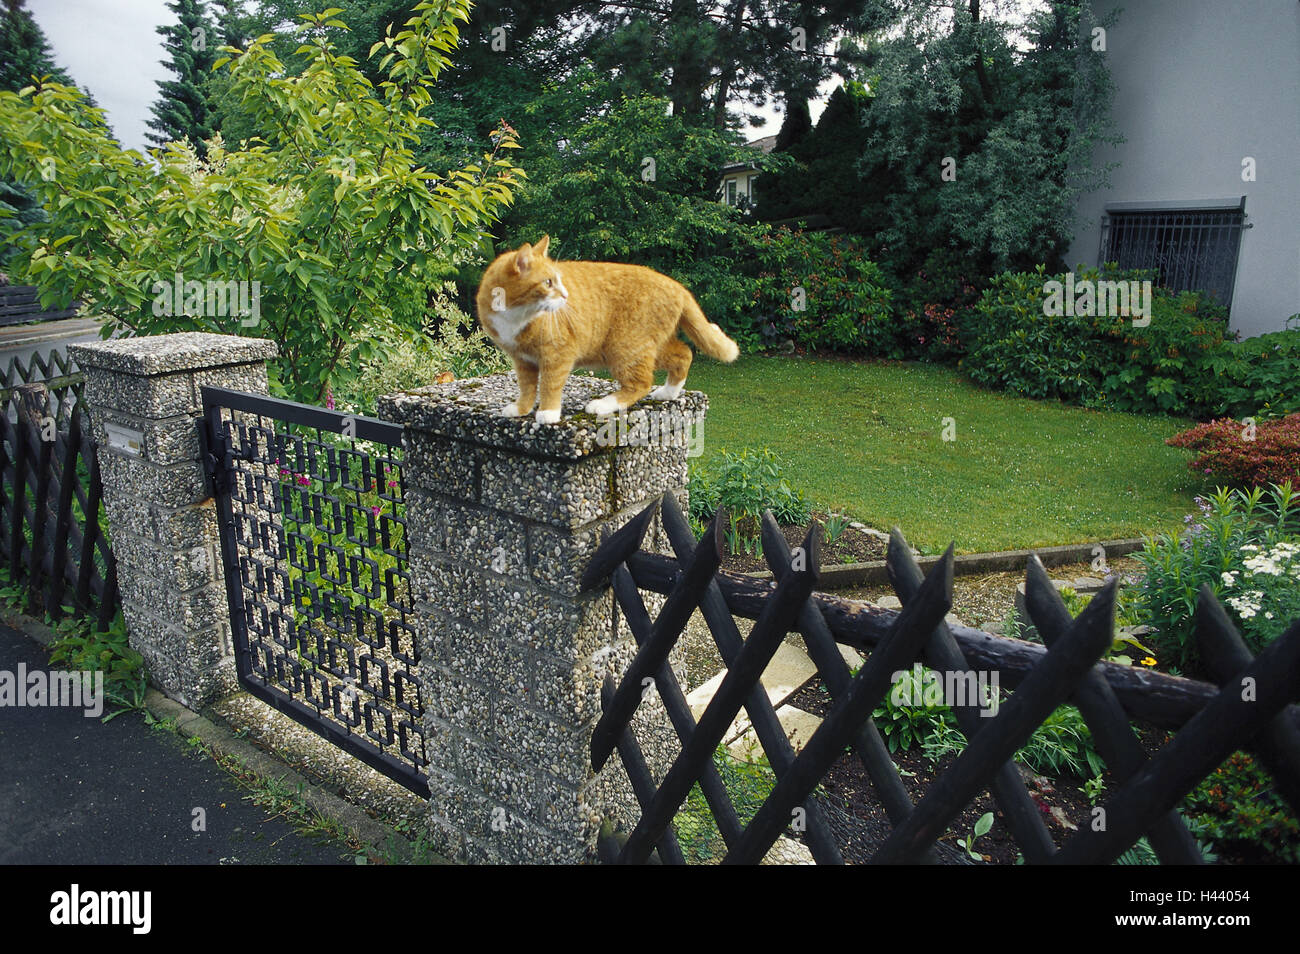 Garden fence, gatepost, cat, sit, look around side view, fence, garden, property, goal, garden goal, post, pillar, - Stock Image